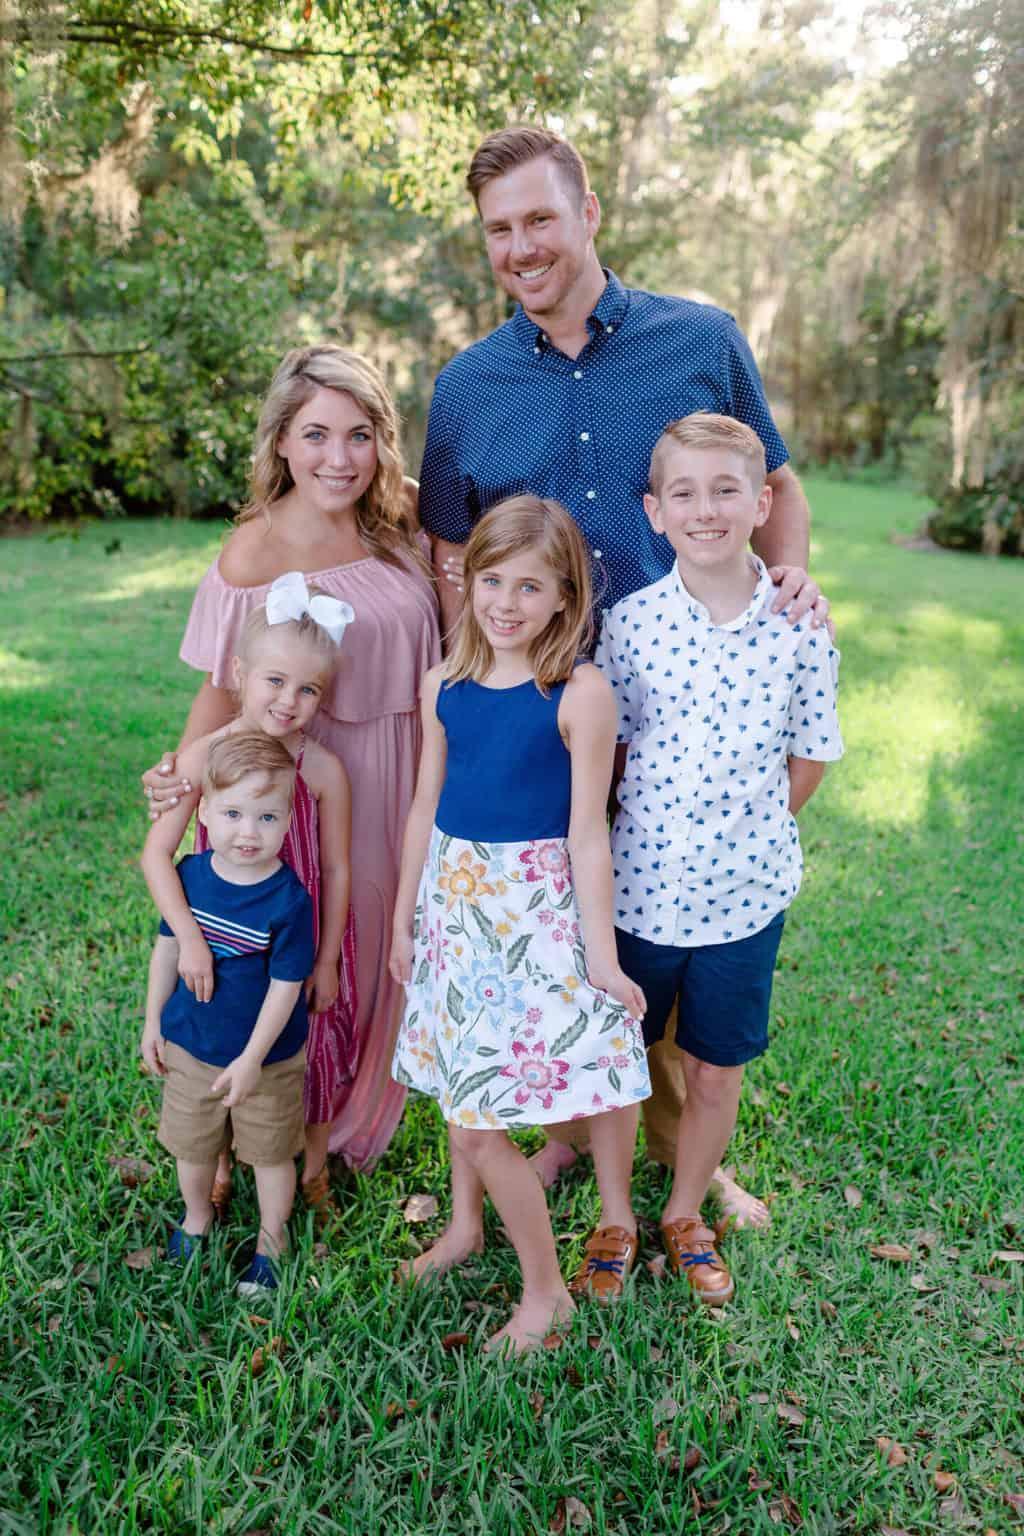 Best Summer Family Photo Ideas